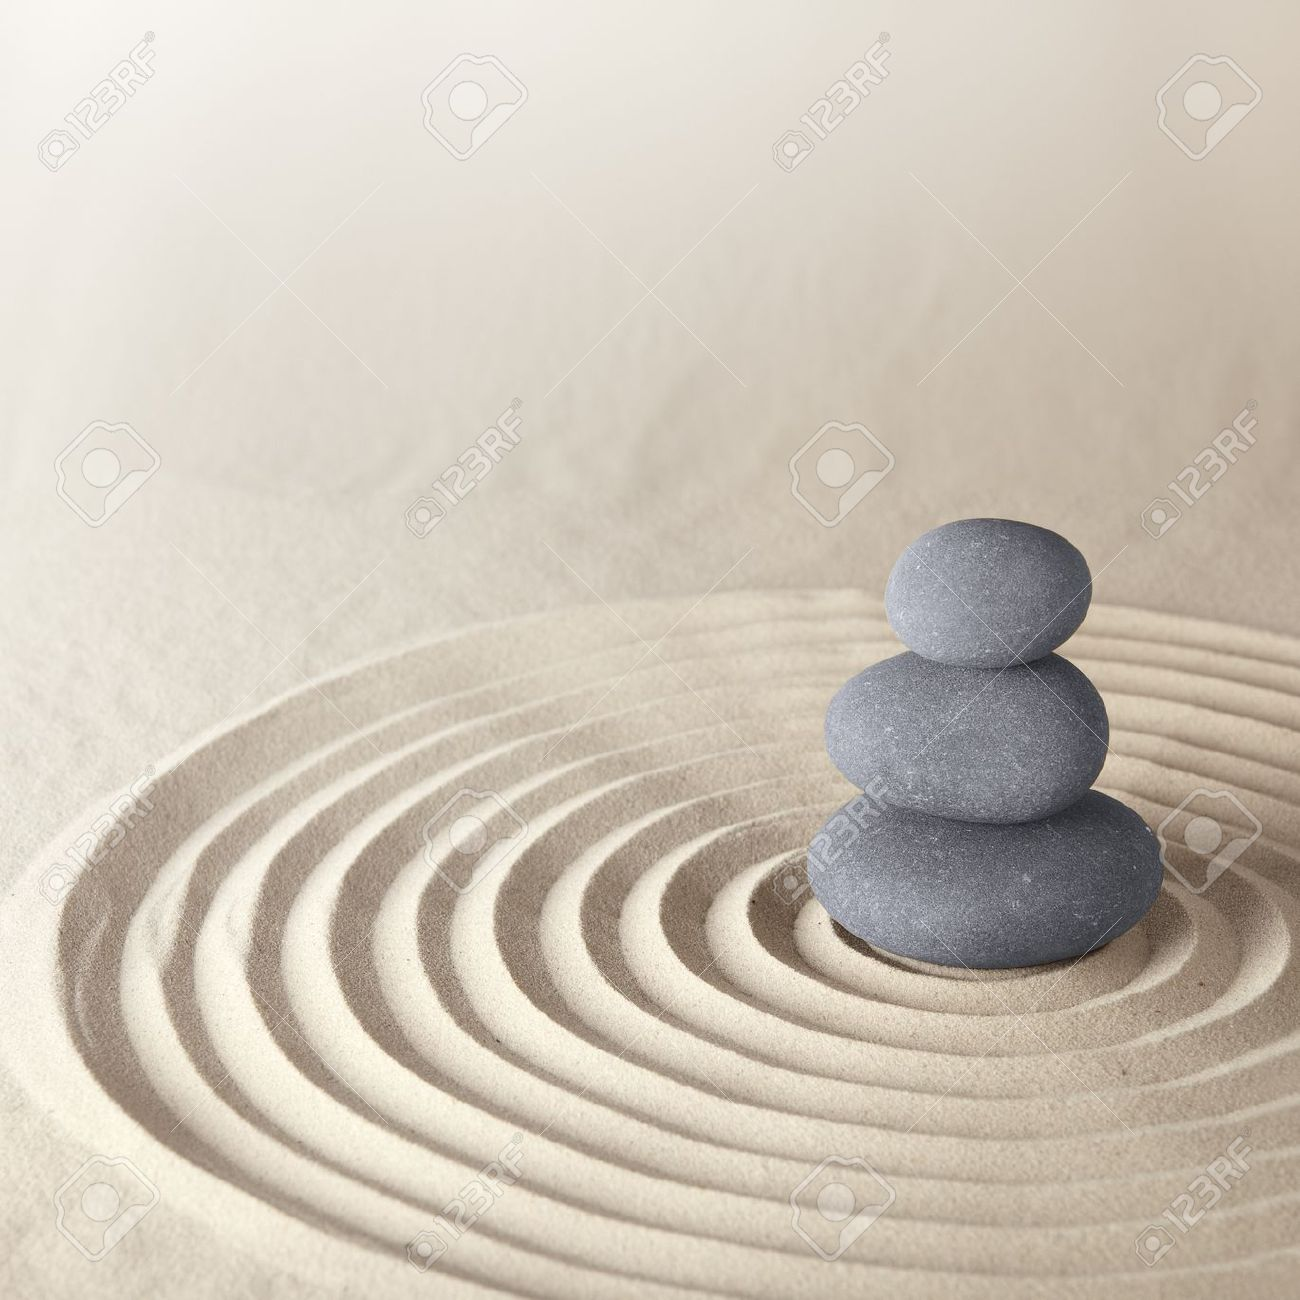 Japanese zen garden meditation stone for concentration and japanese zen garden meditation stone for concentration and relaxation sand and rock for harmony and balance workwithnaturefo